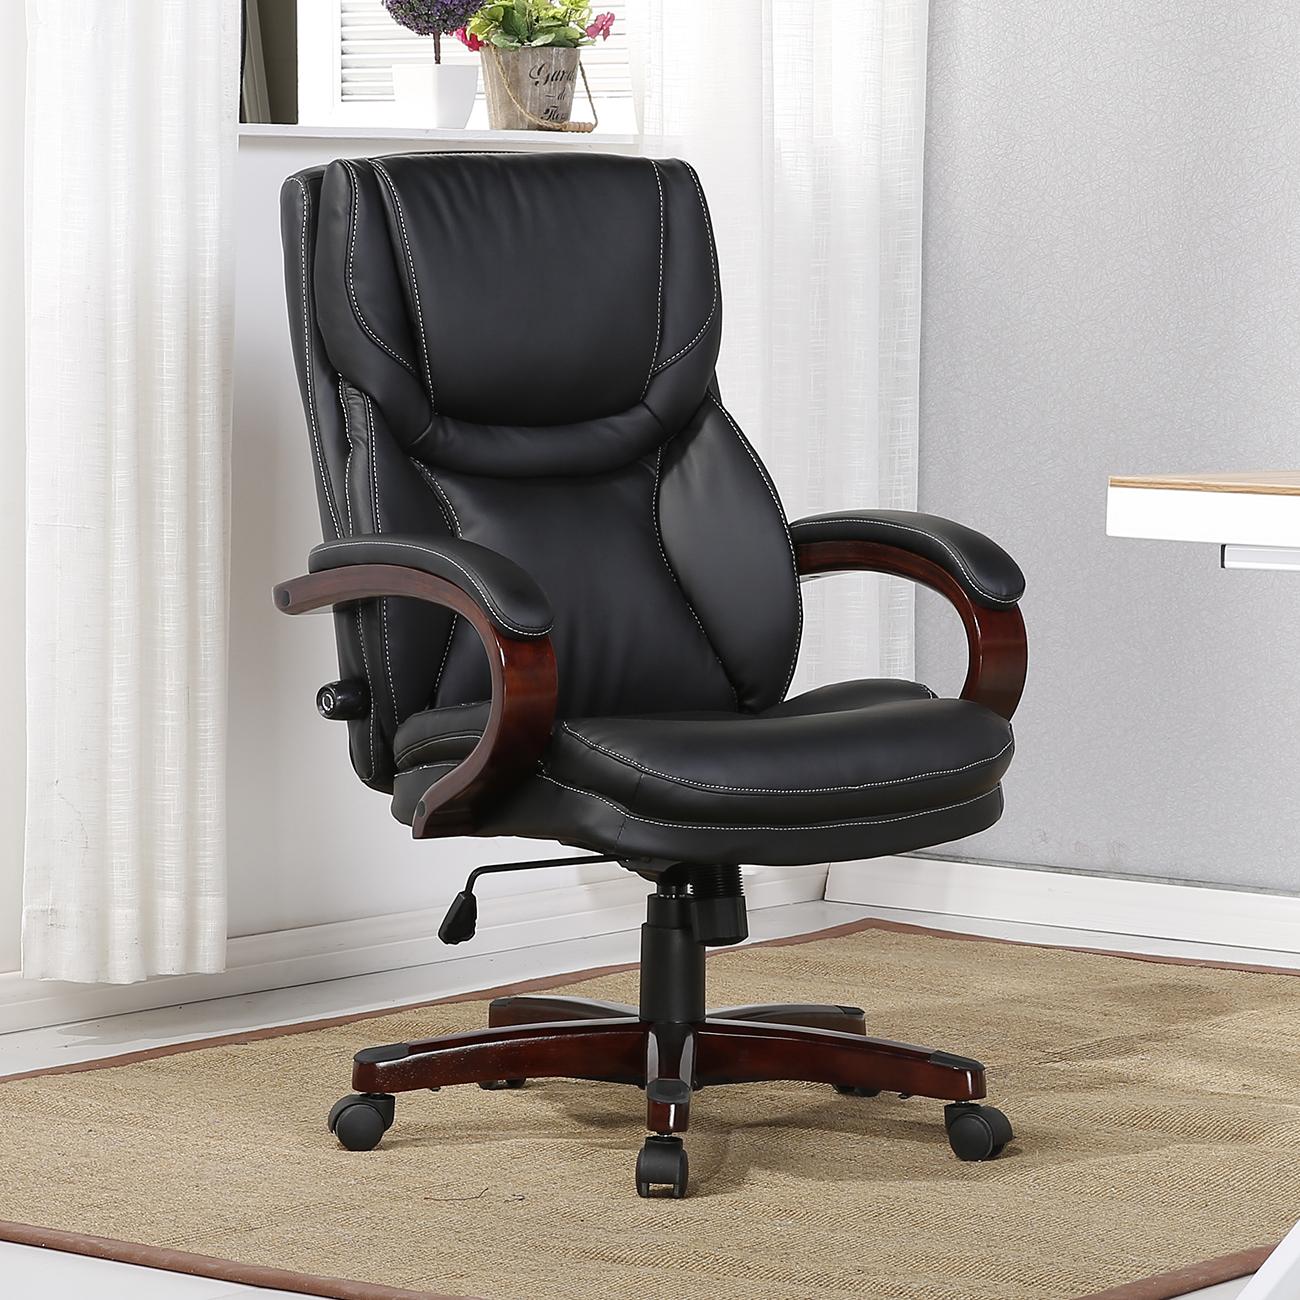 Executive Chair High Back Office Desk Arm Lumbar Support